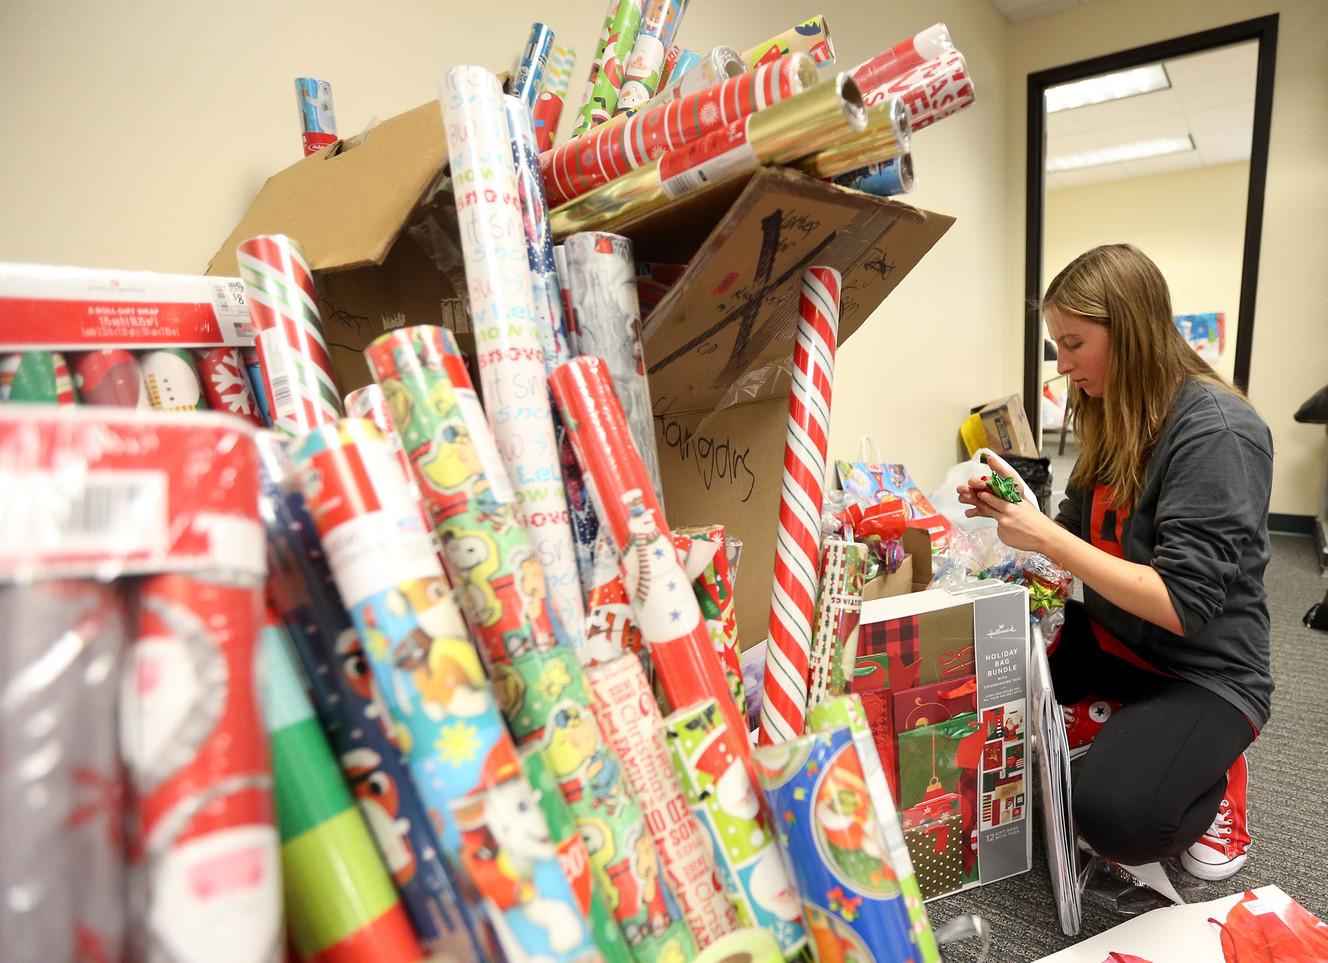 Holiday gift drive gives 1,500 kids Christmas presents   KSL.com